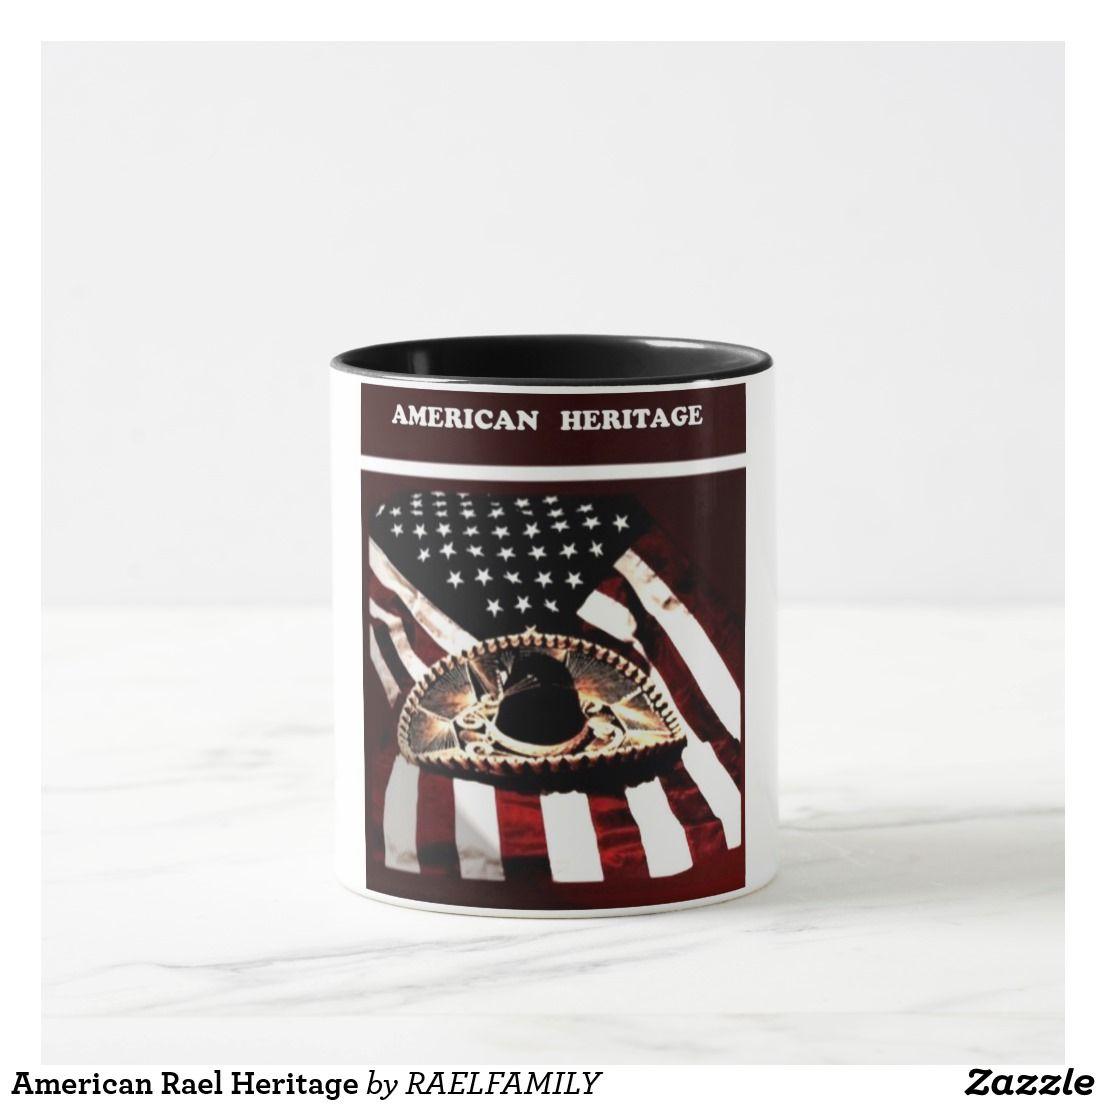 Sentimental Wedding Gift Ideas: American Rael Heritage Mug